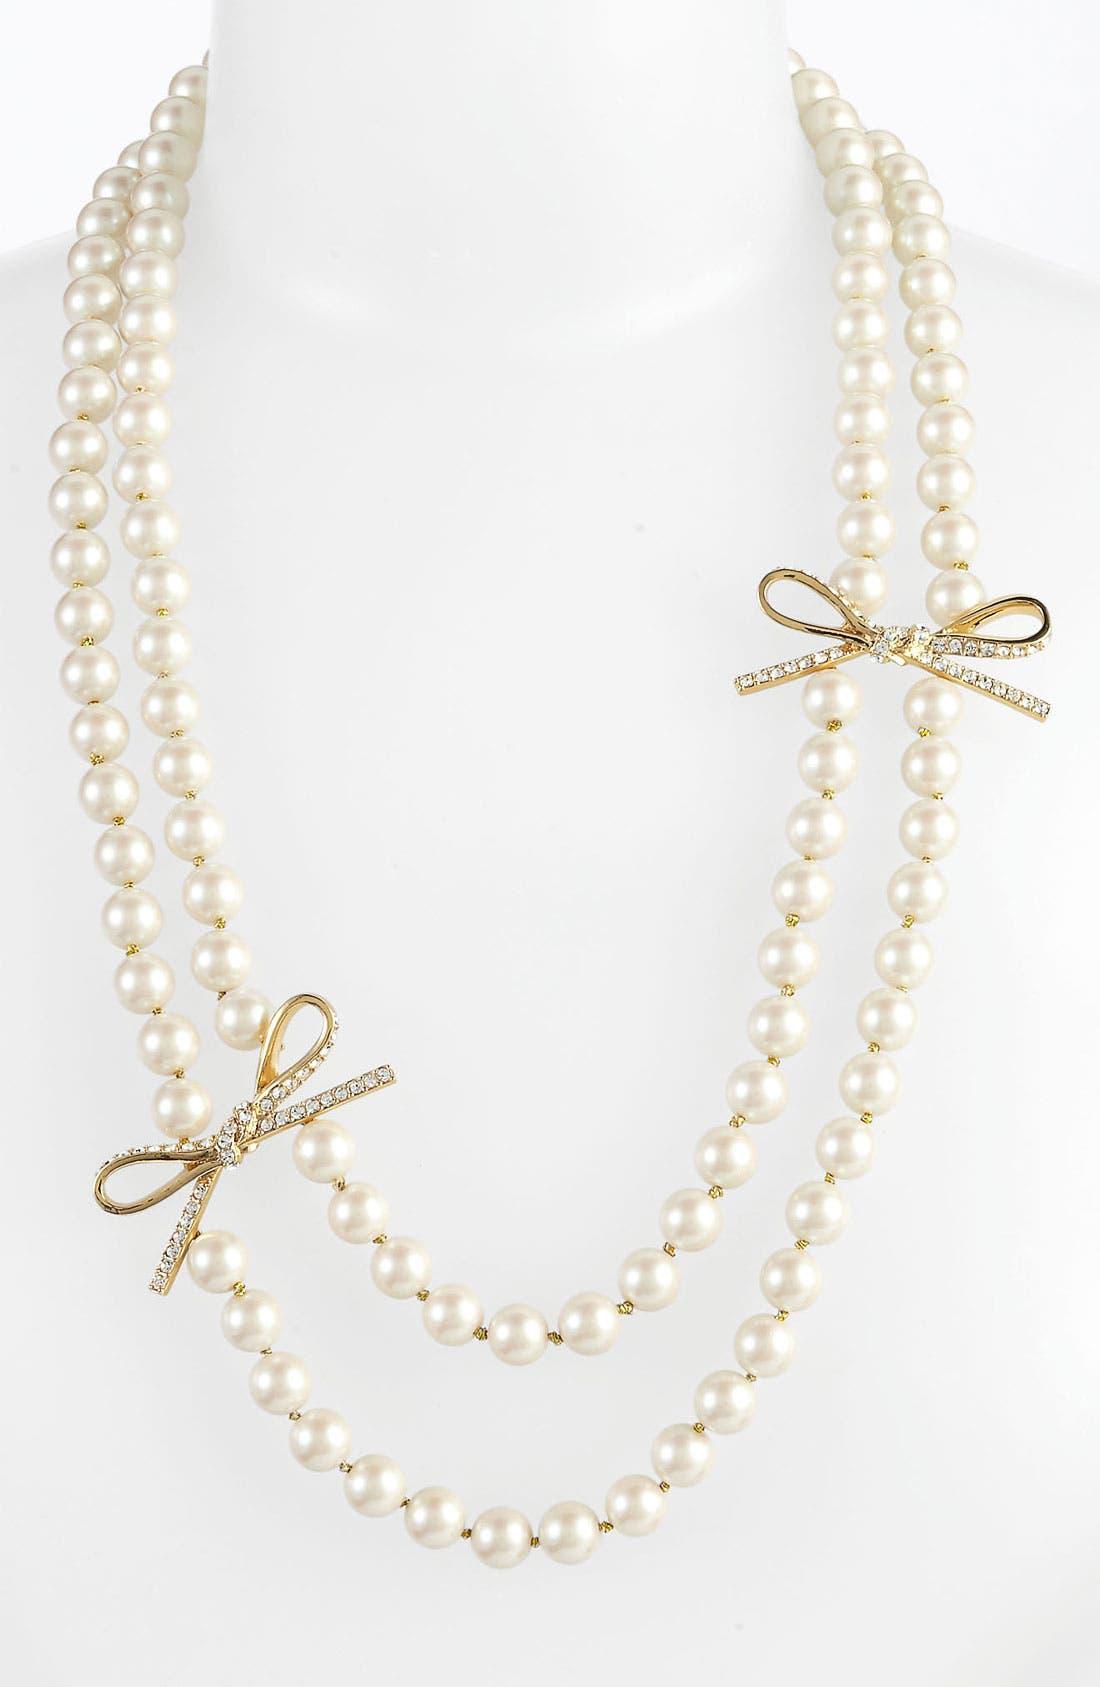 Main Image - kate spade new york 'skinny mini' faux pearl necklace